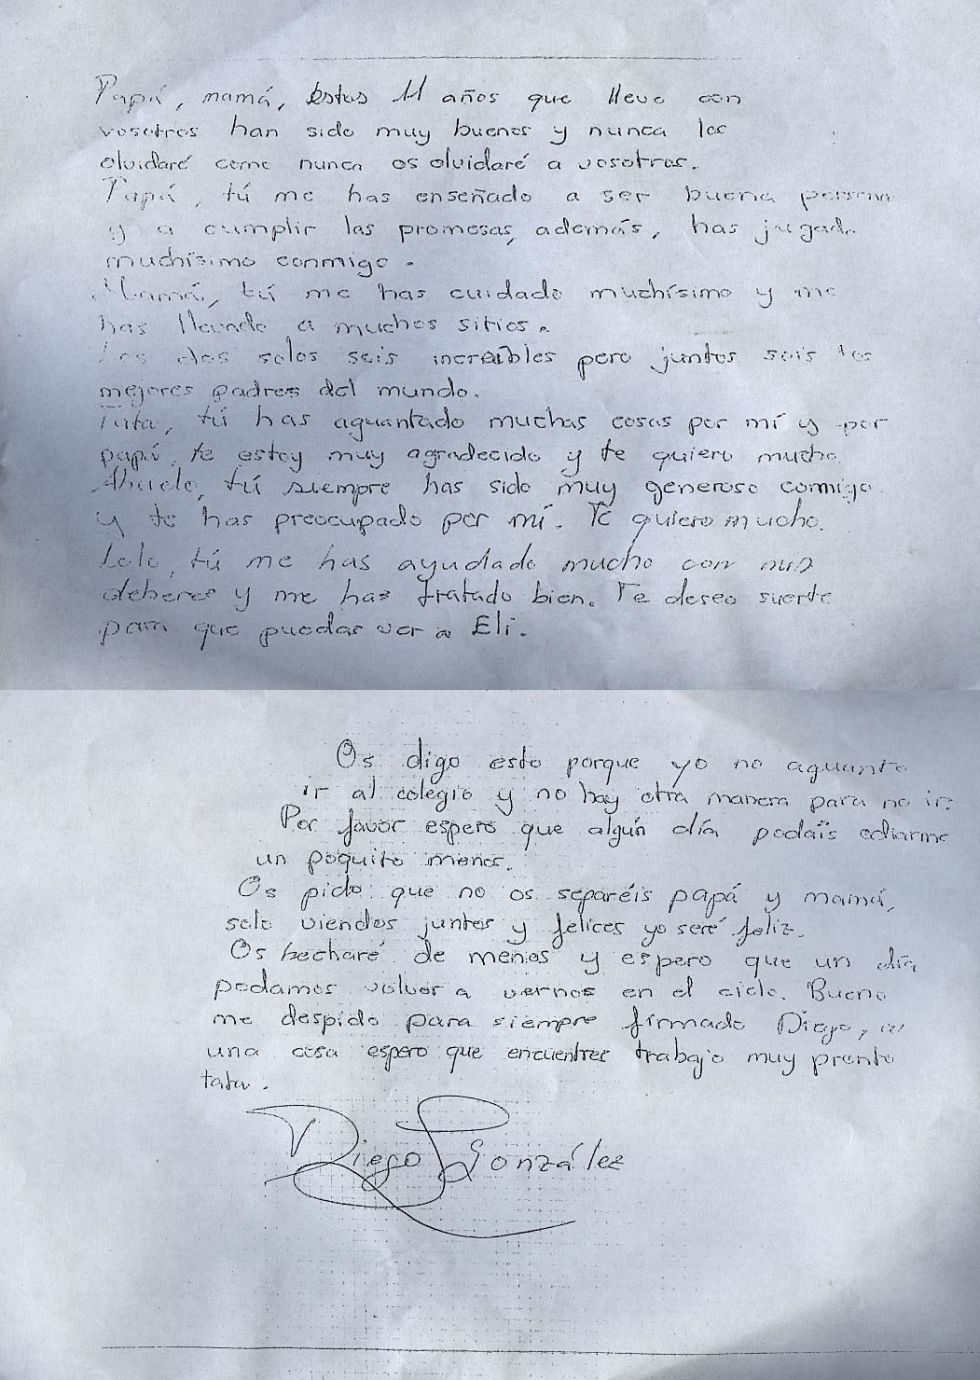 Carta de Diego